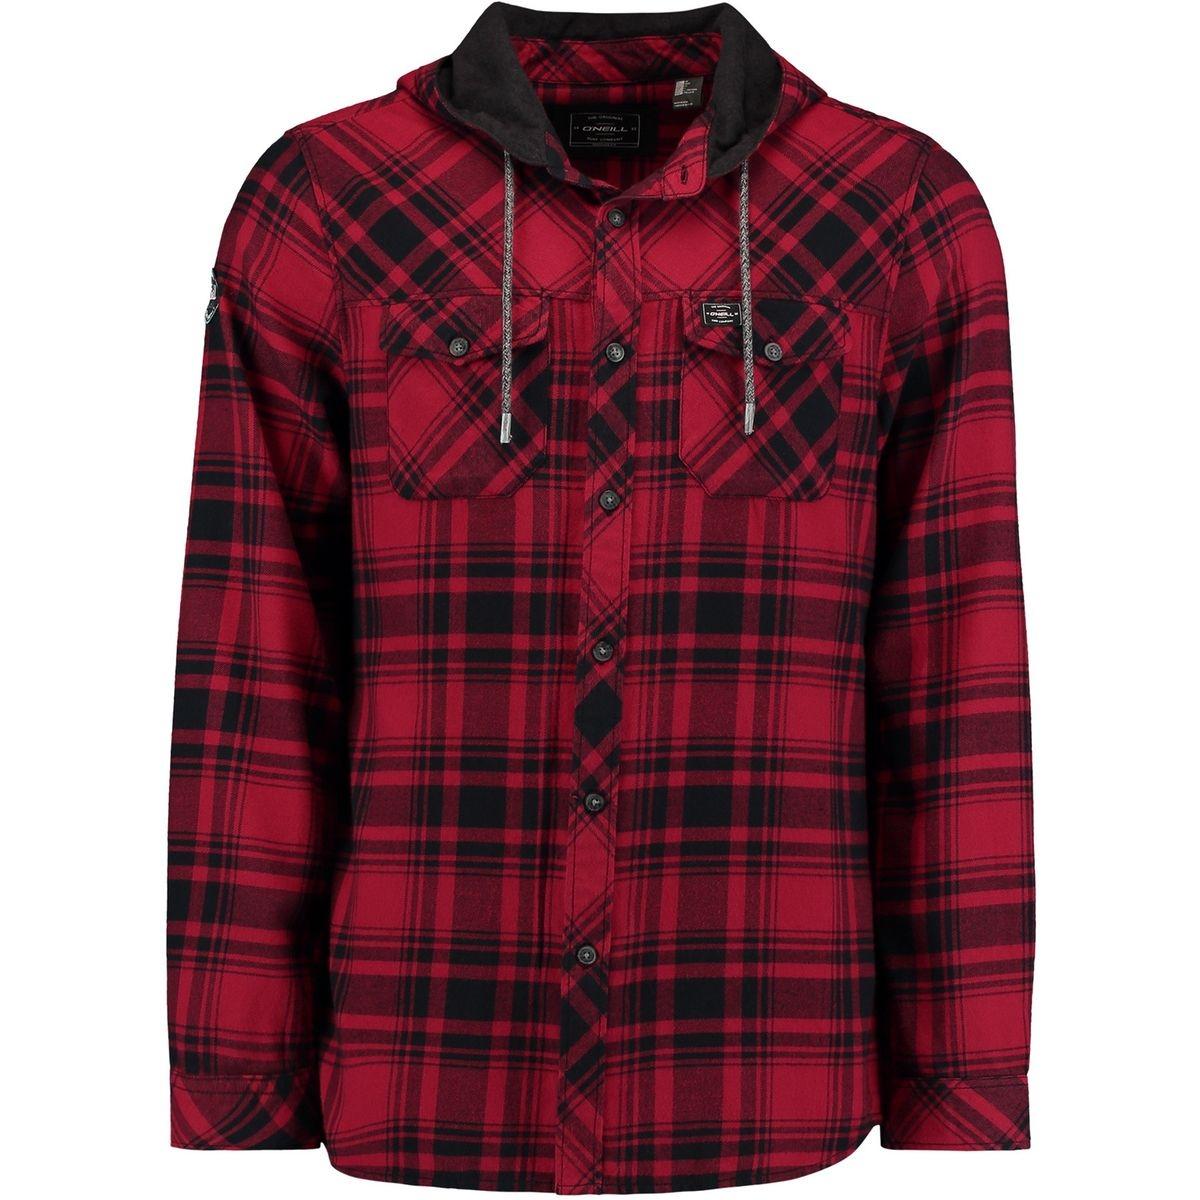 Chemise à capuche Violator